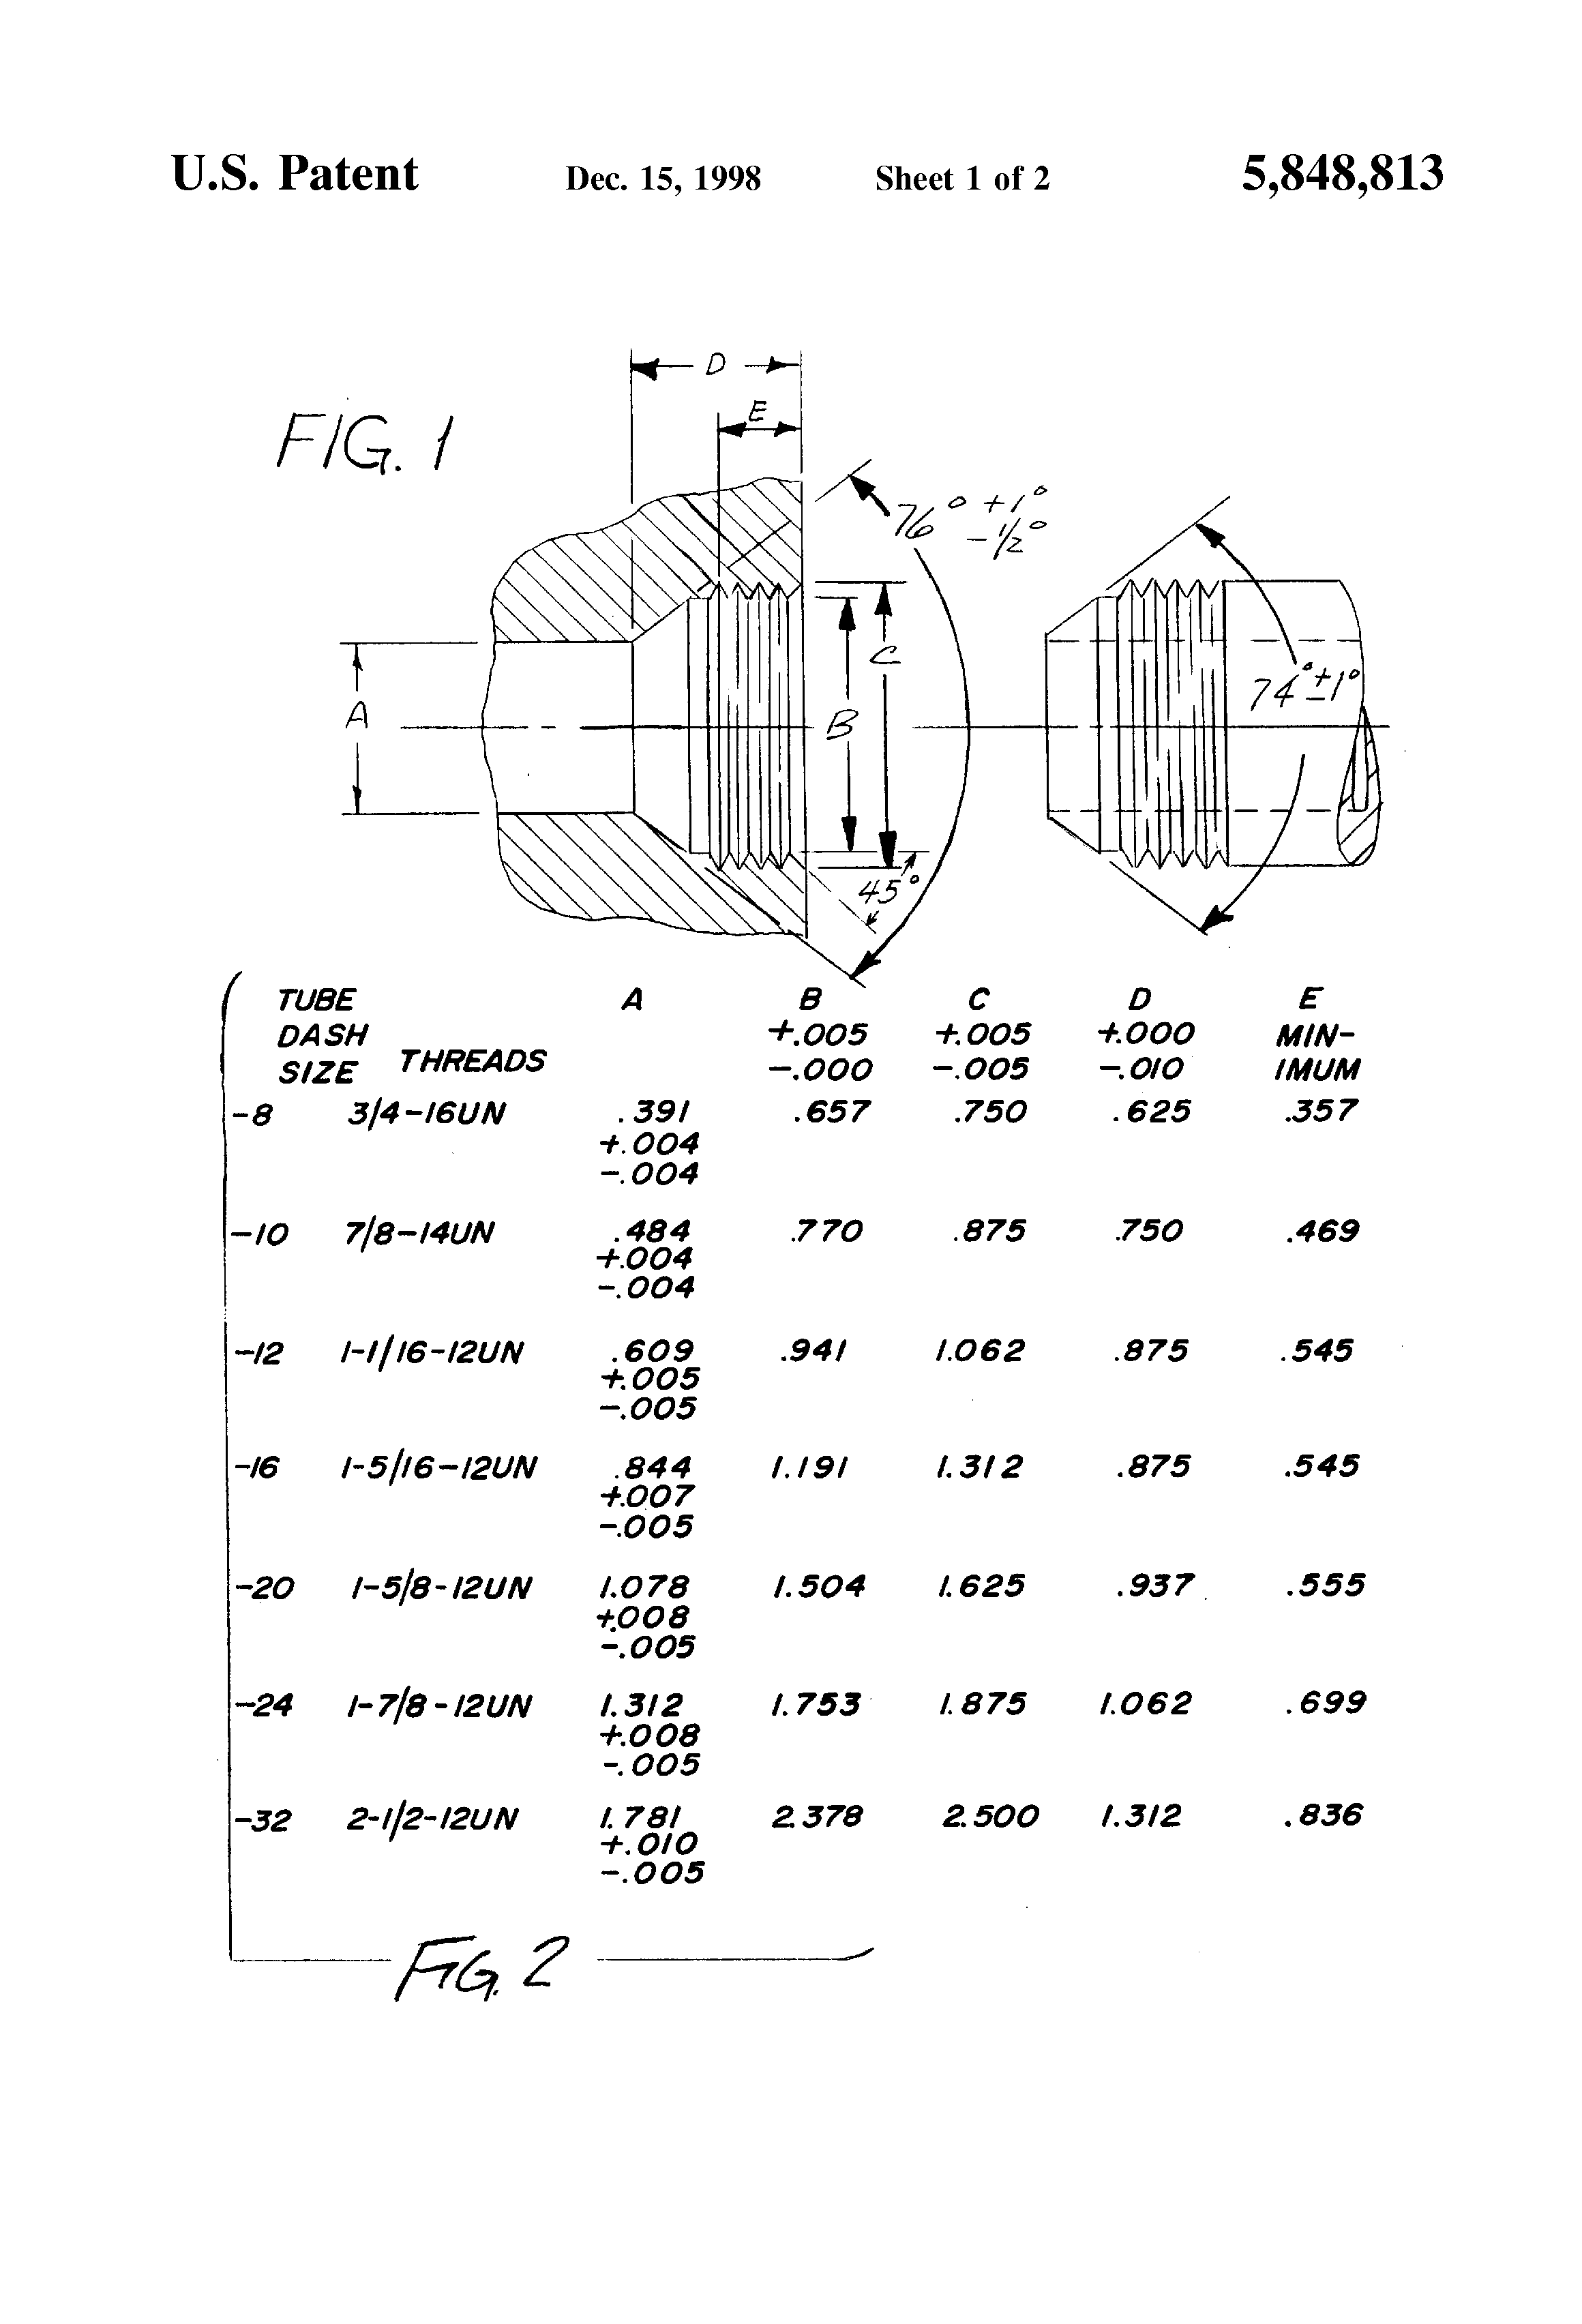 Port assignments